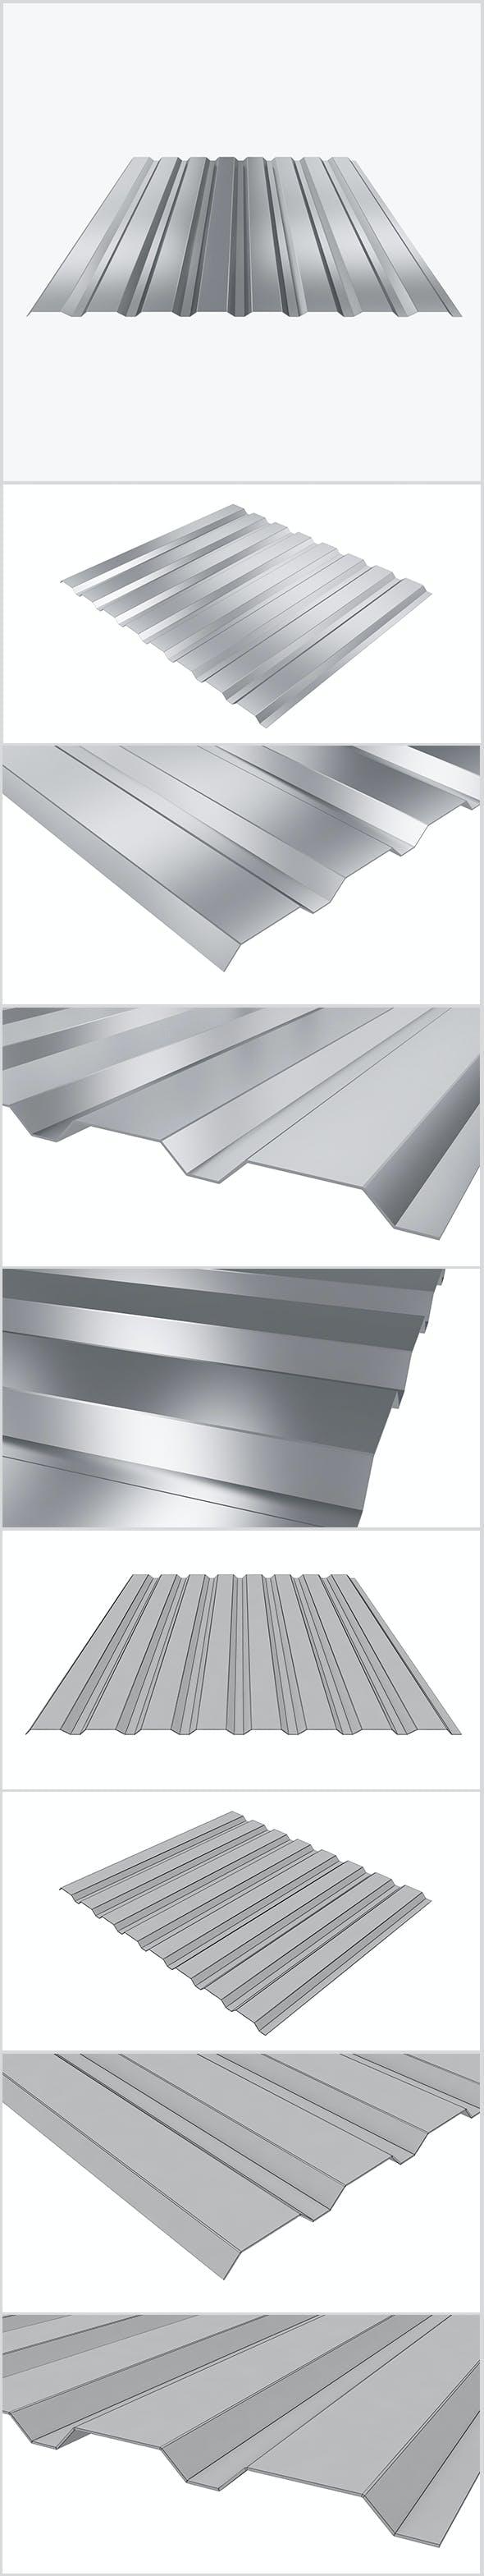 Profiled sheet 01 - 3DOcean Item for Sale